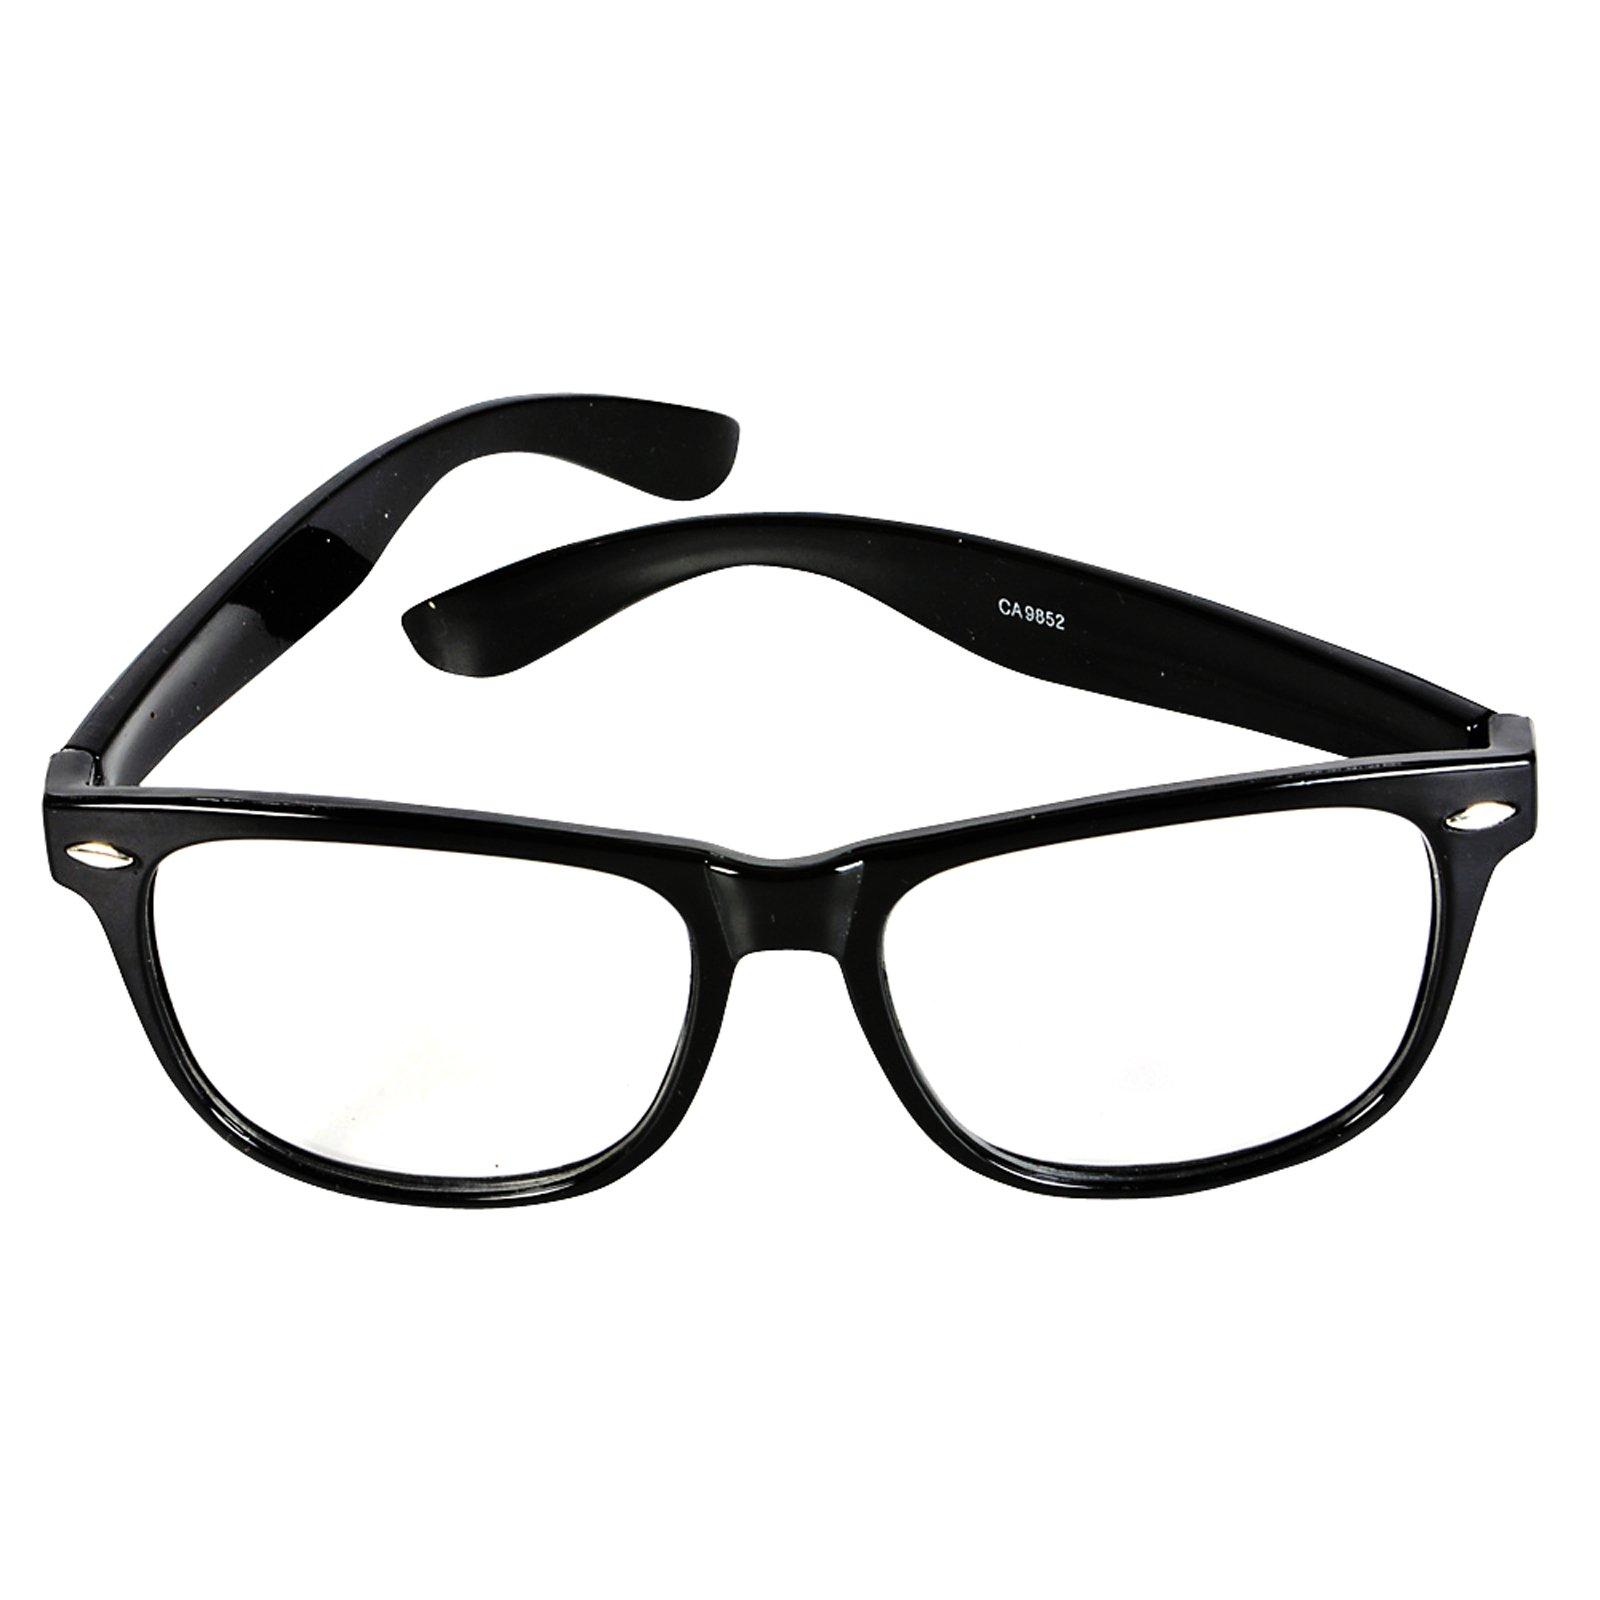 Nerd glasses glasses clipart clip art nerd ut7l